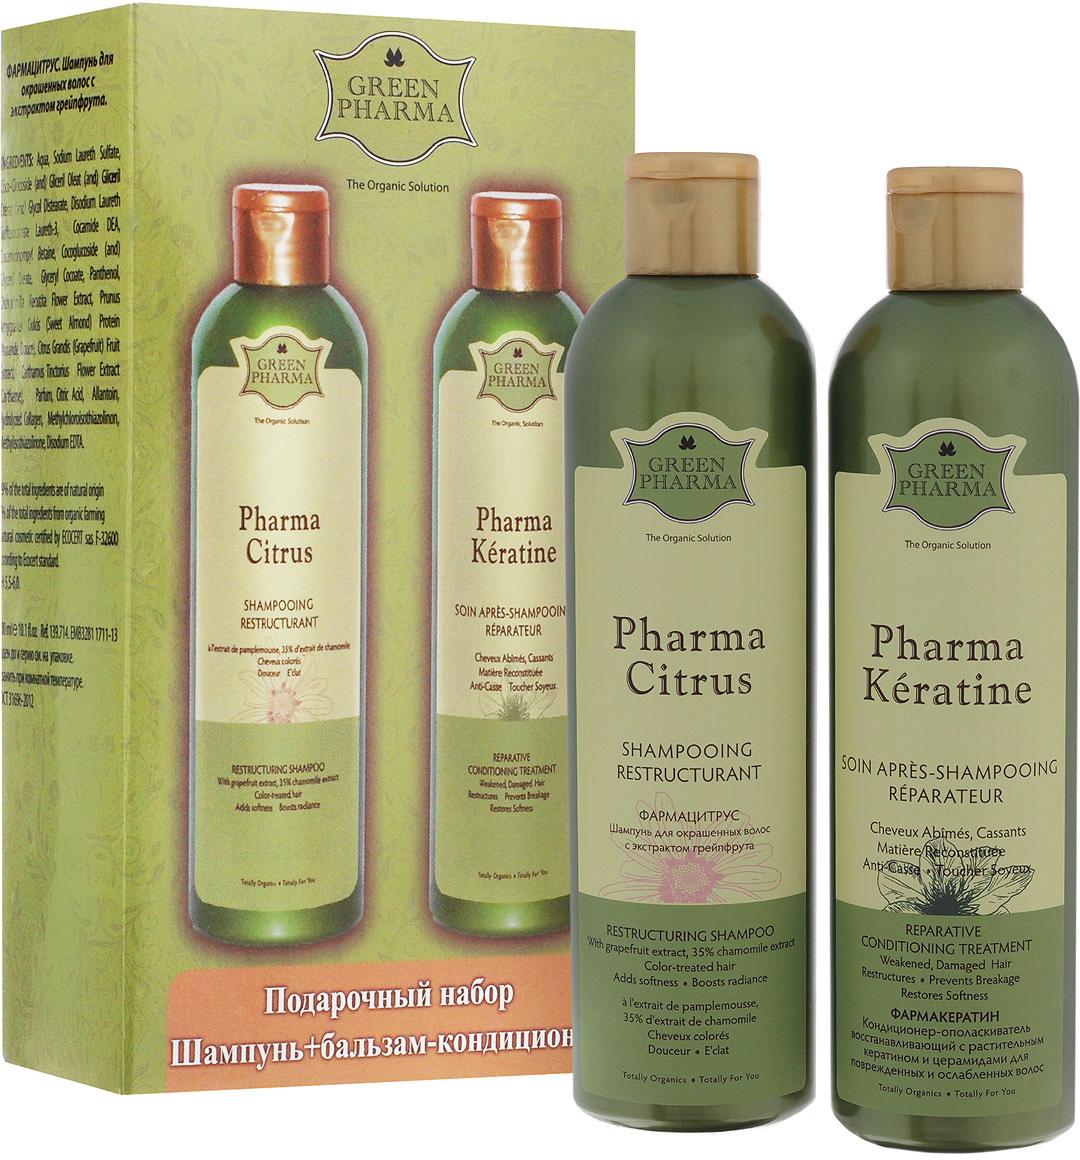 Greenpharma Подарочный набор №3: шампунь